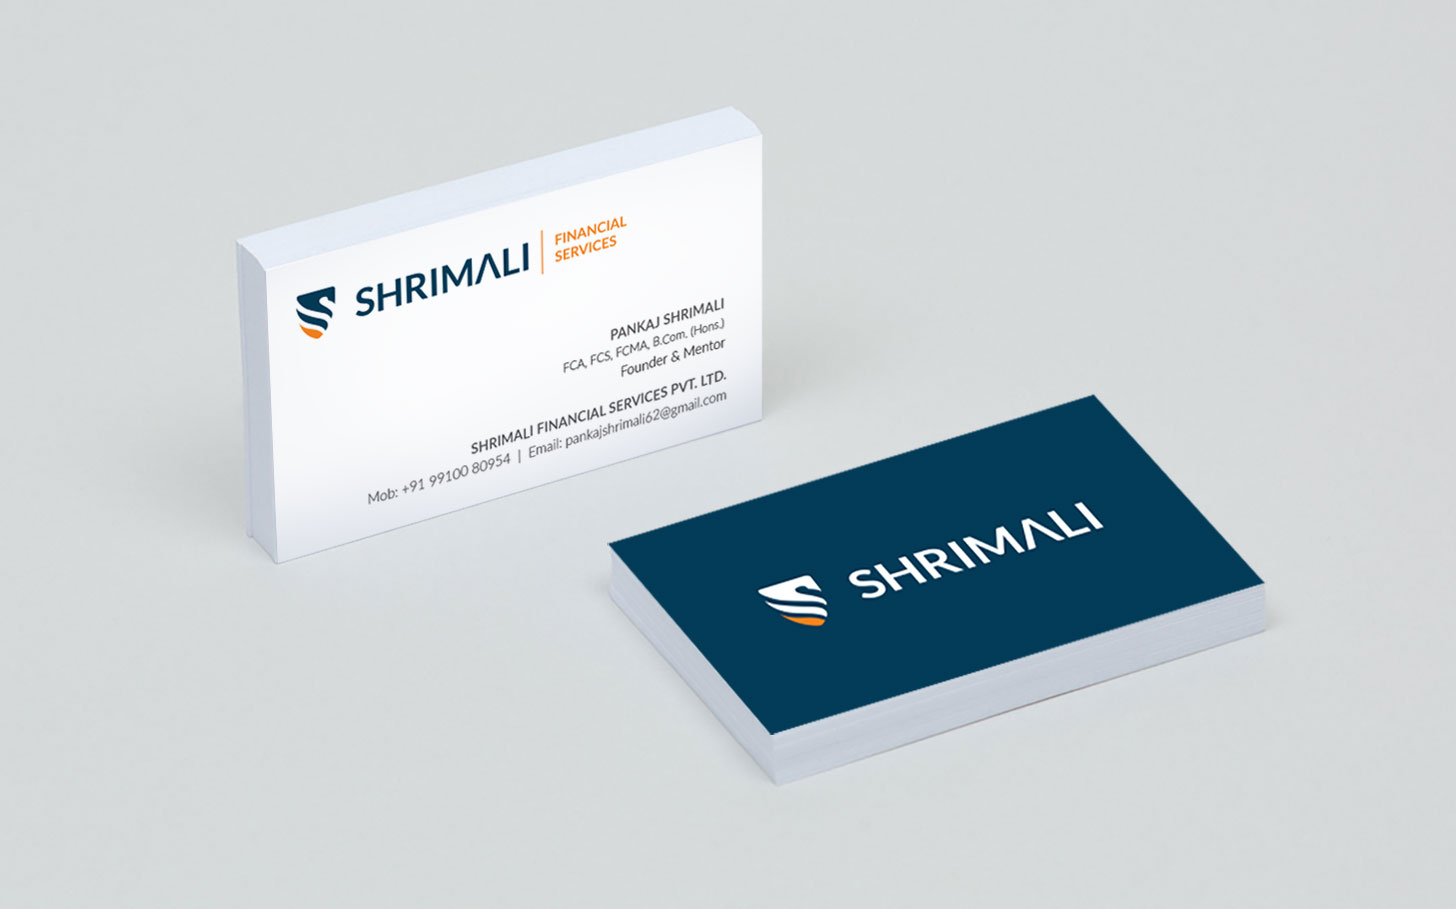 Shrimali_4